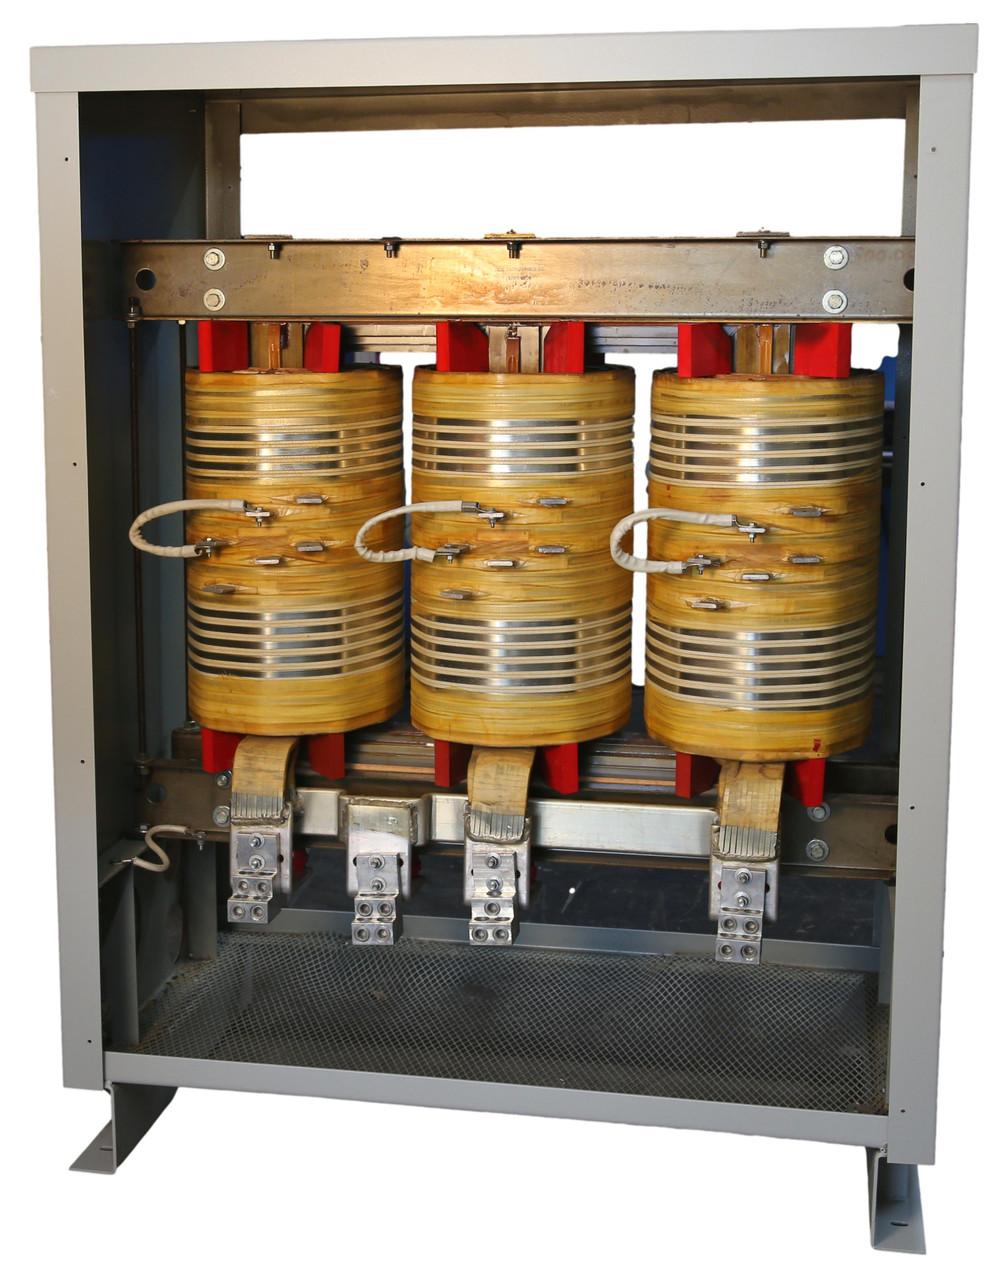 500 kVA Dry Transformer